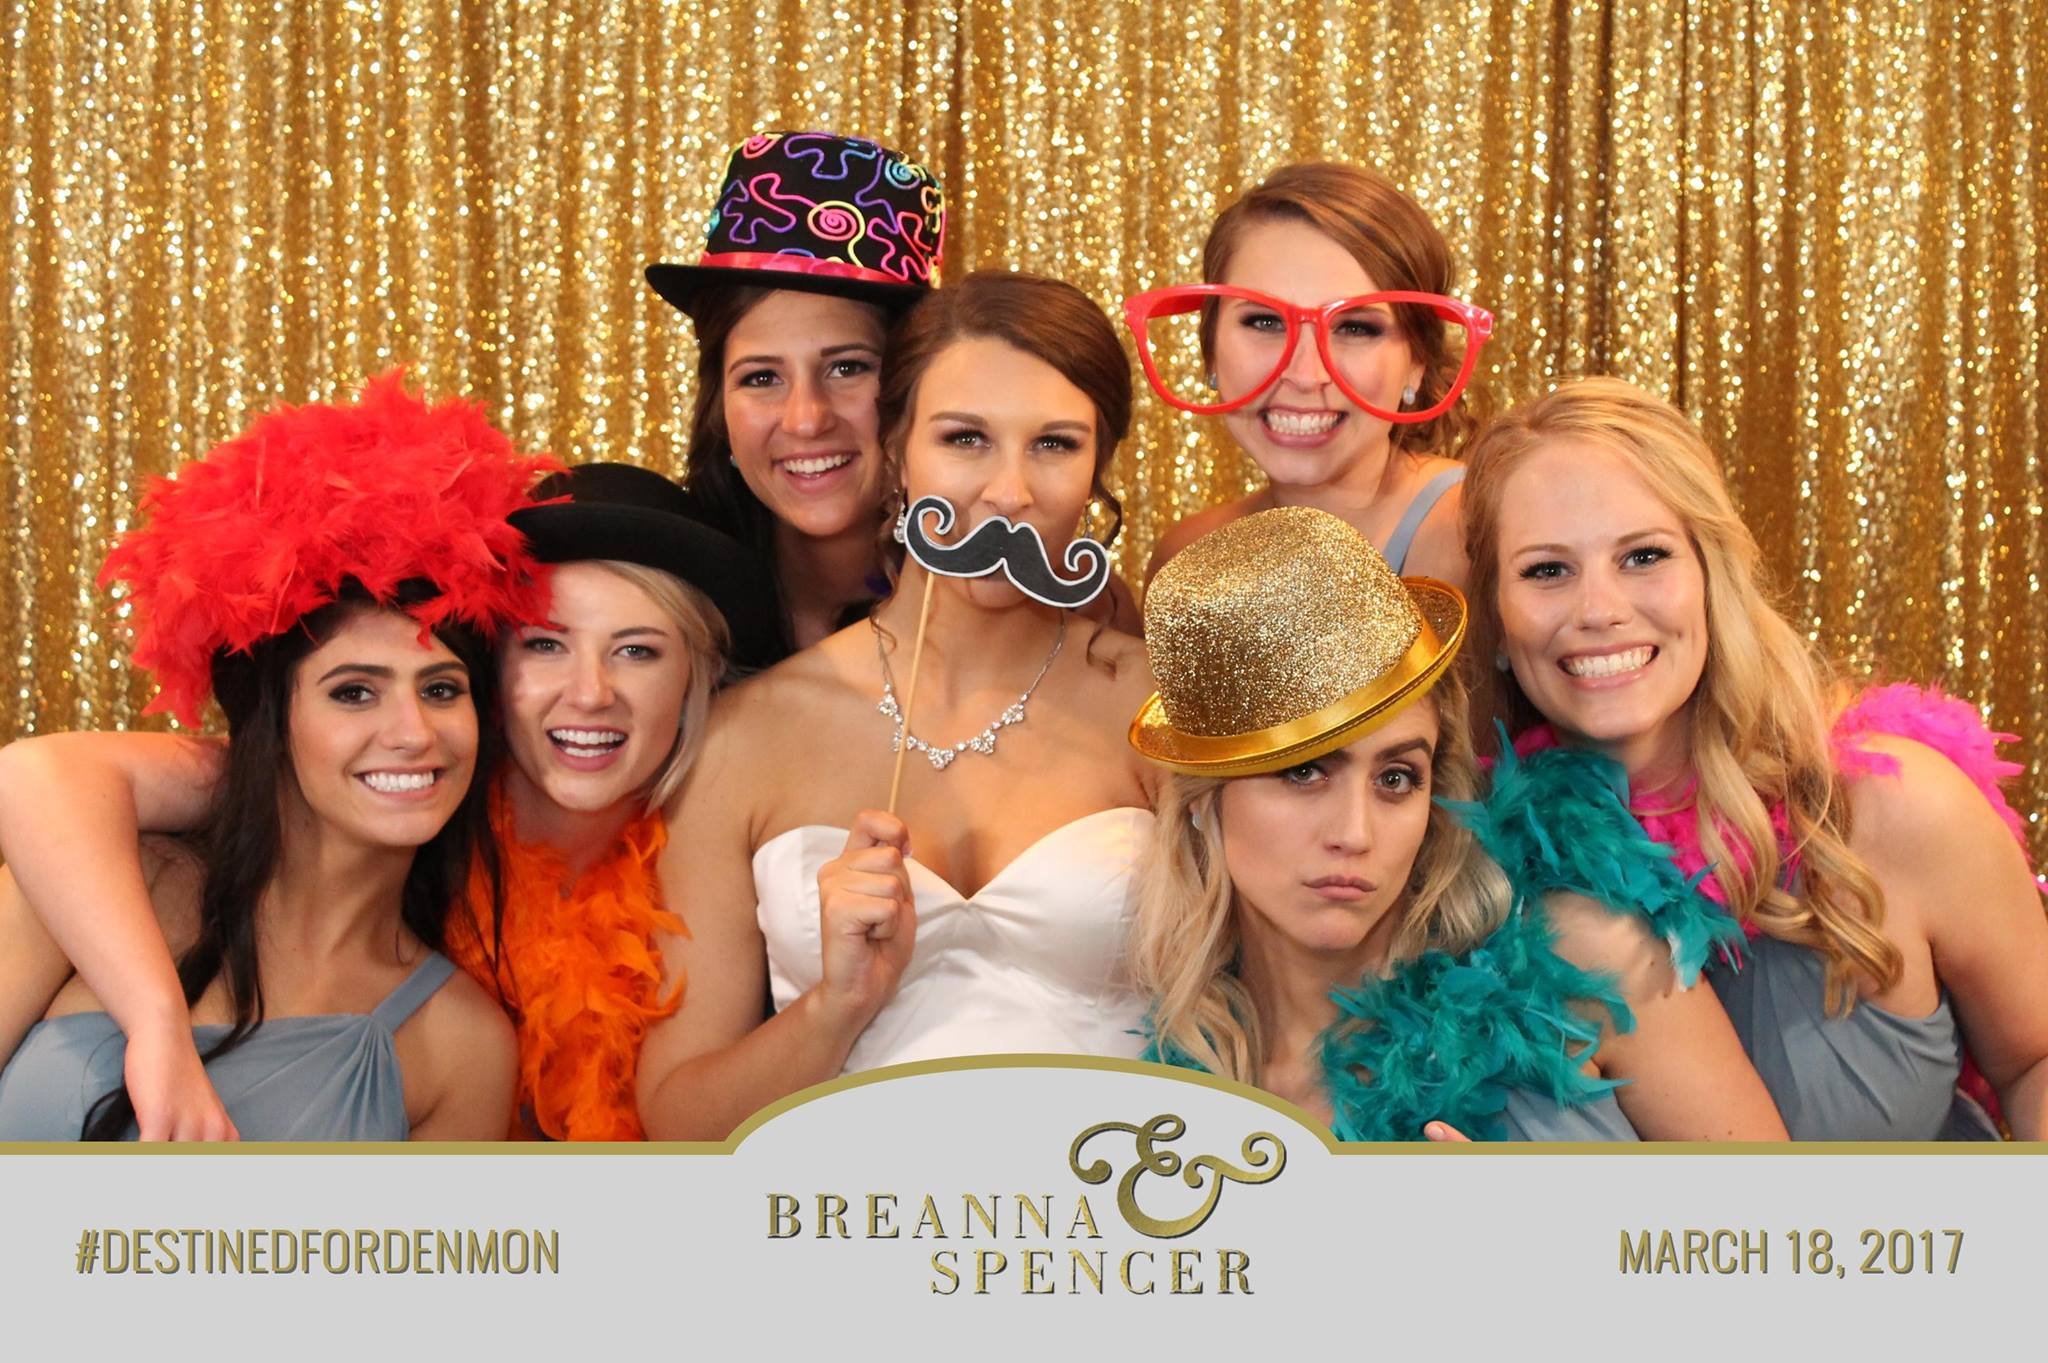 Wedding Entertainment Photo Booth